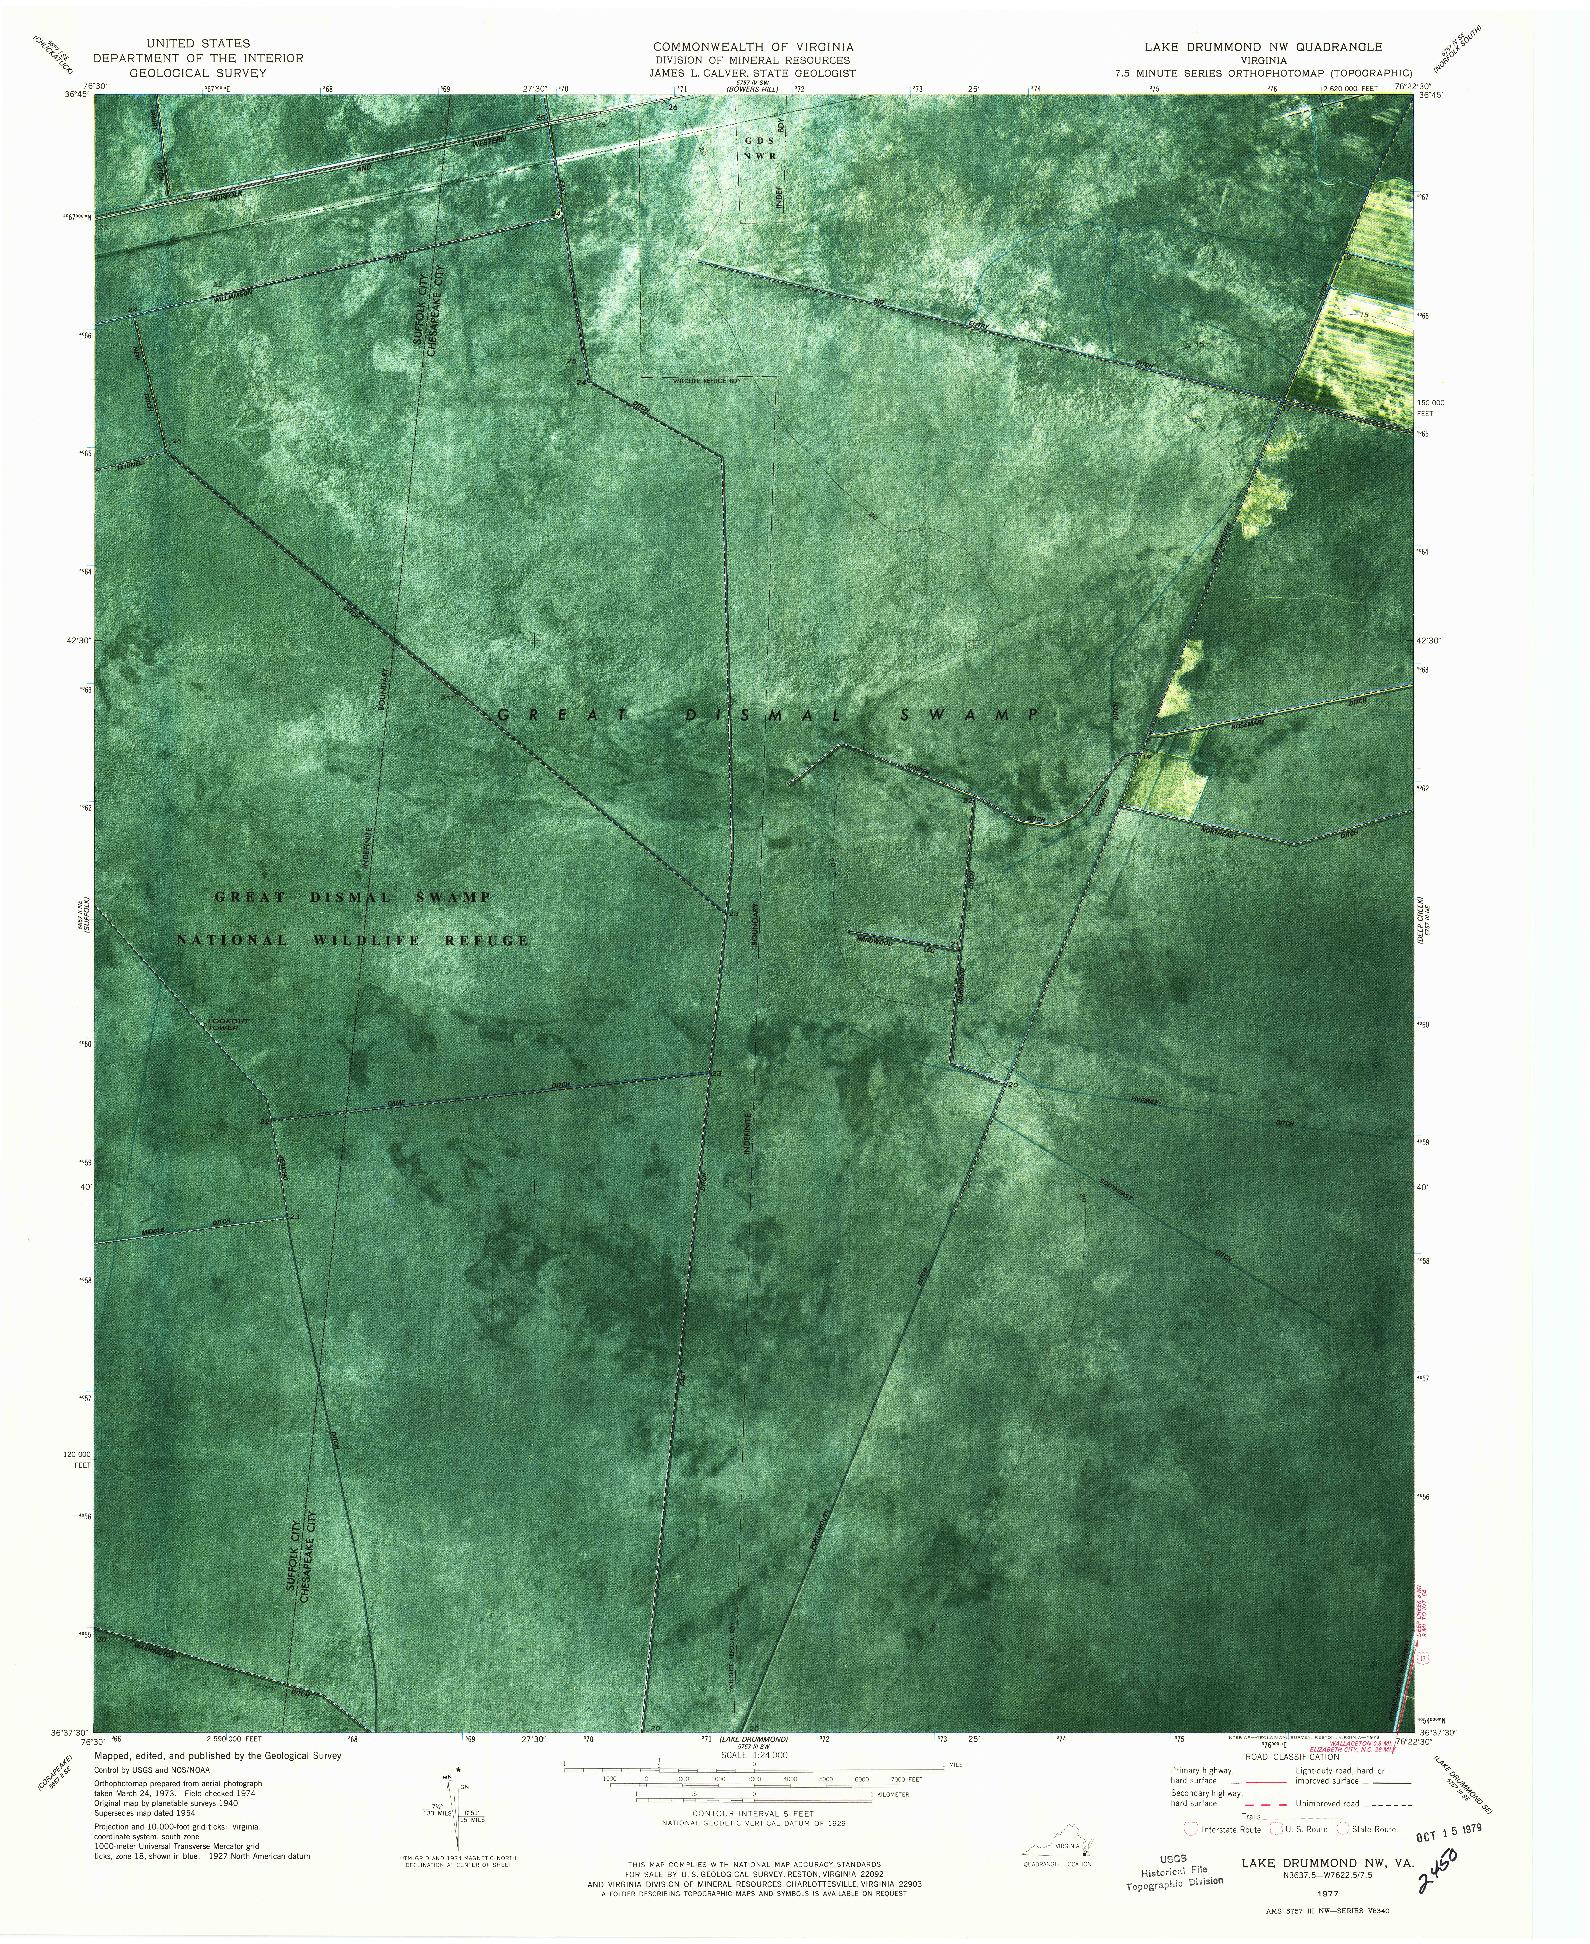 USGS 1:24000-SCALE QUADRANGLE FOR LAKE DRUMMOND NW, VA 1977